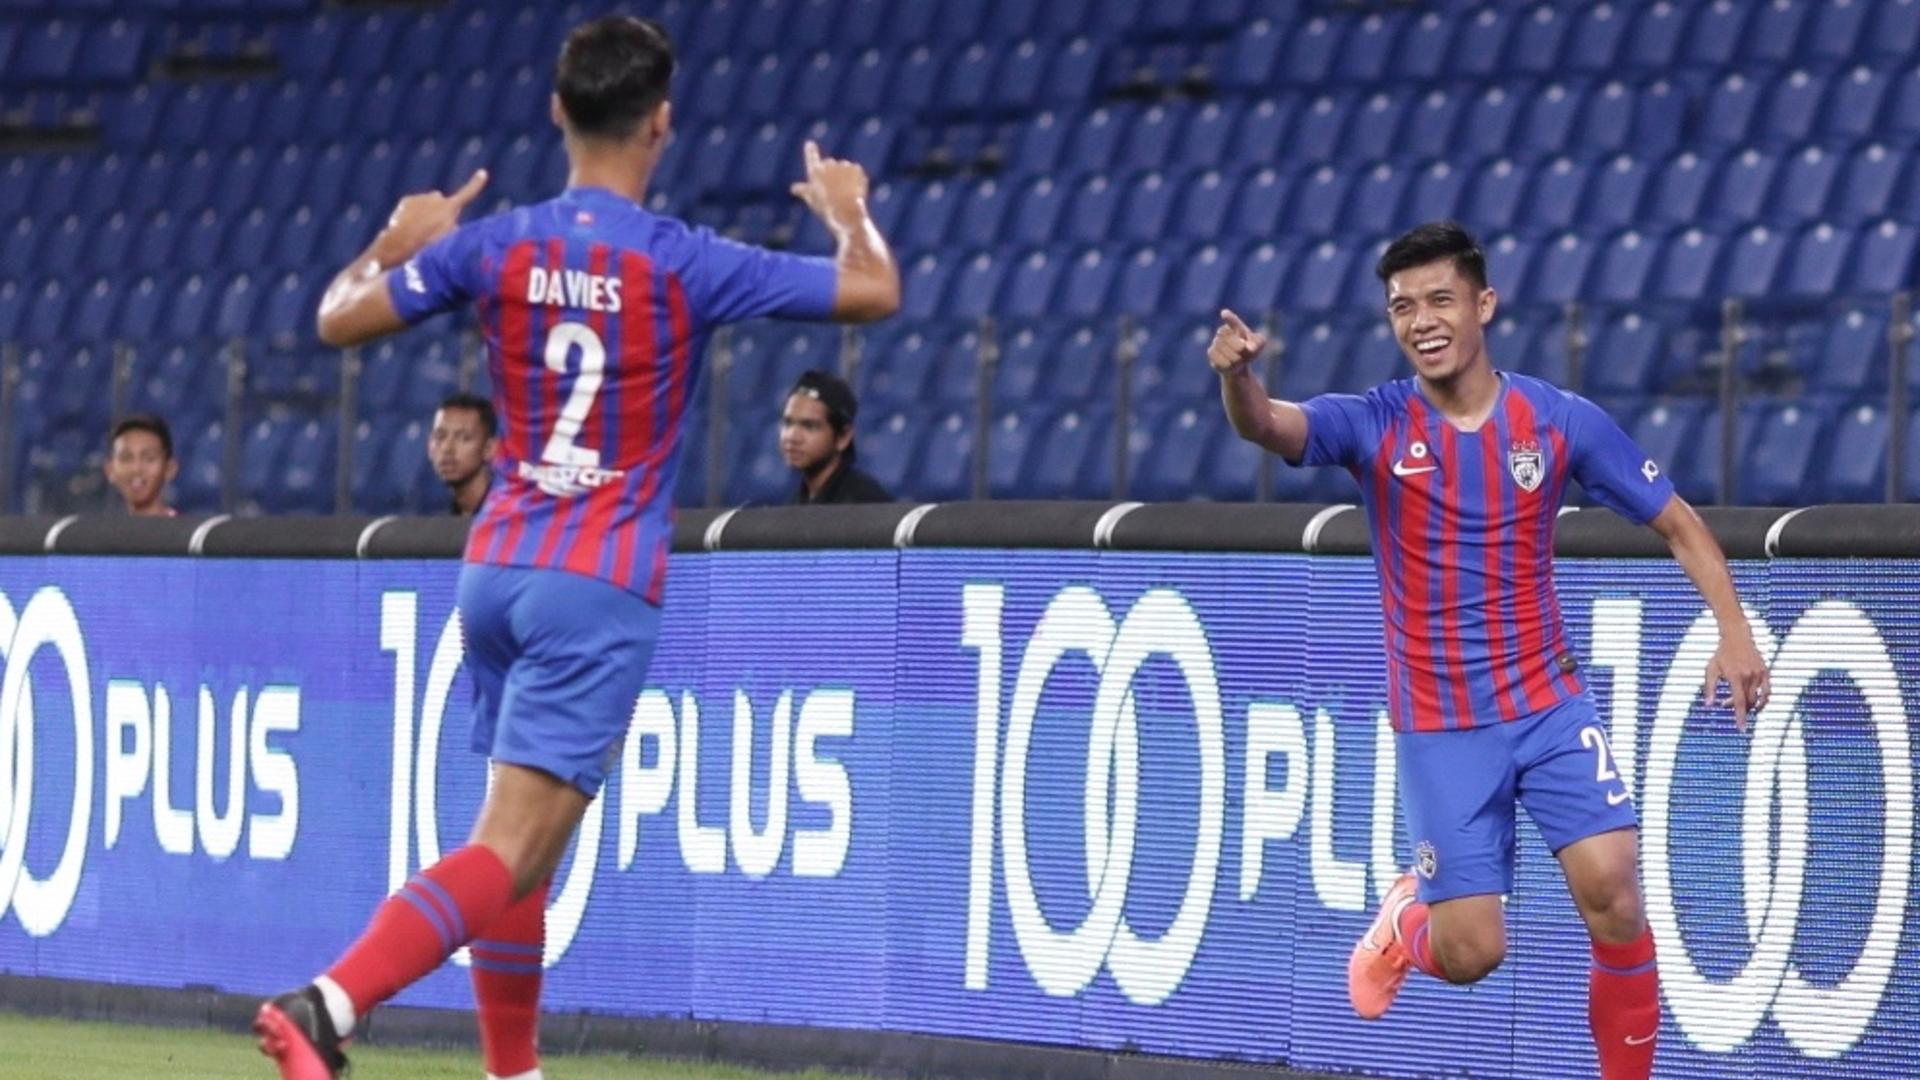 Syafiq Ahmad, Johor Darul Ta'zim, Super League, 14 Mar 2020